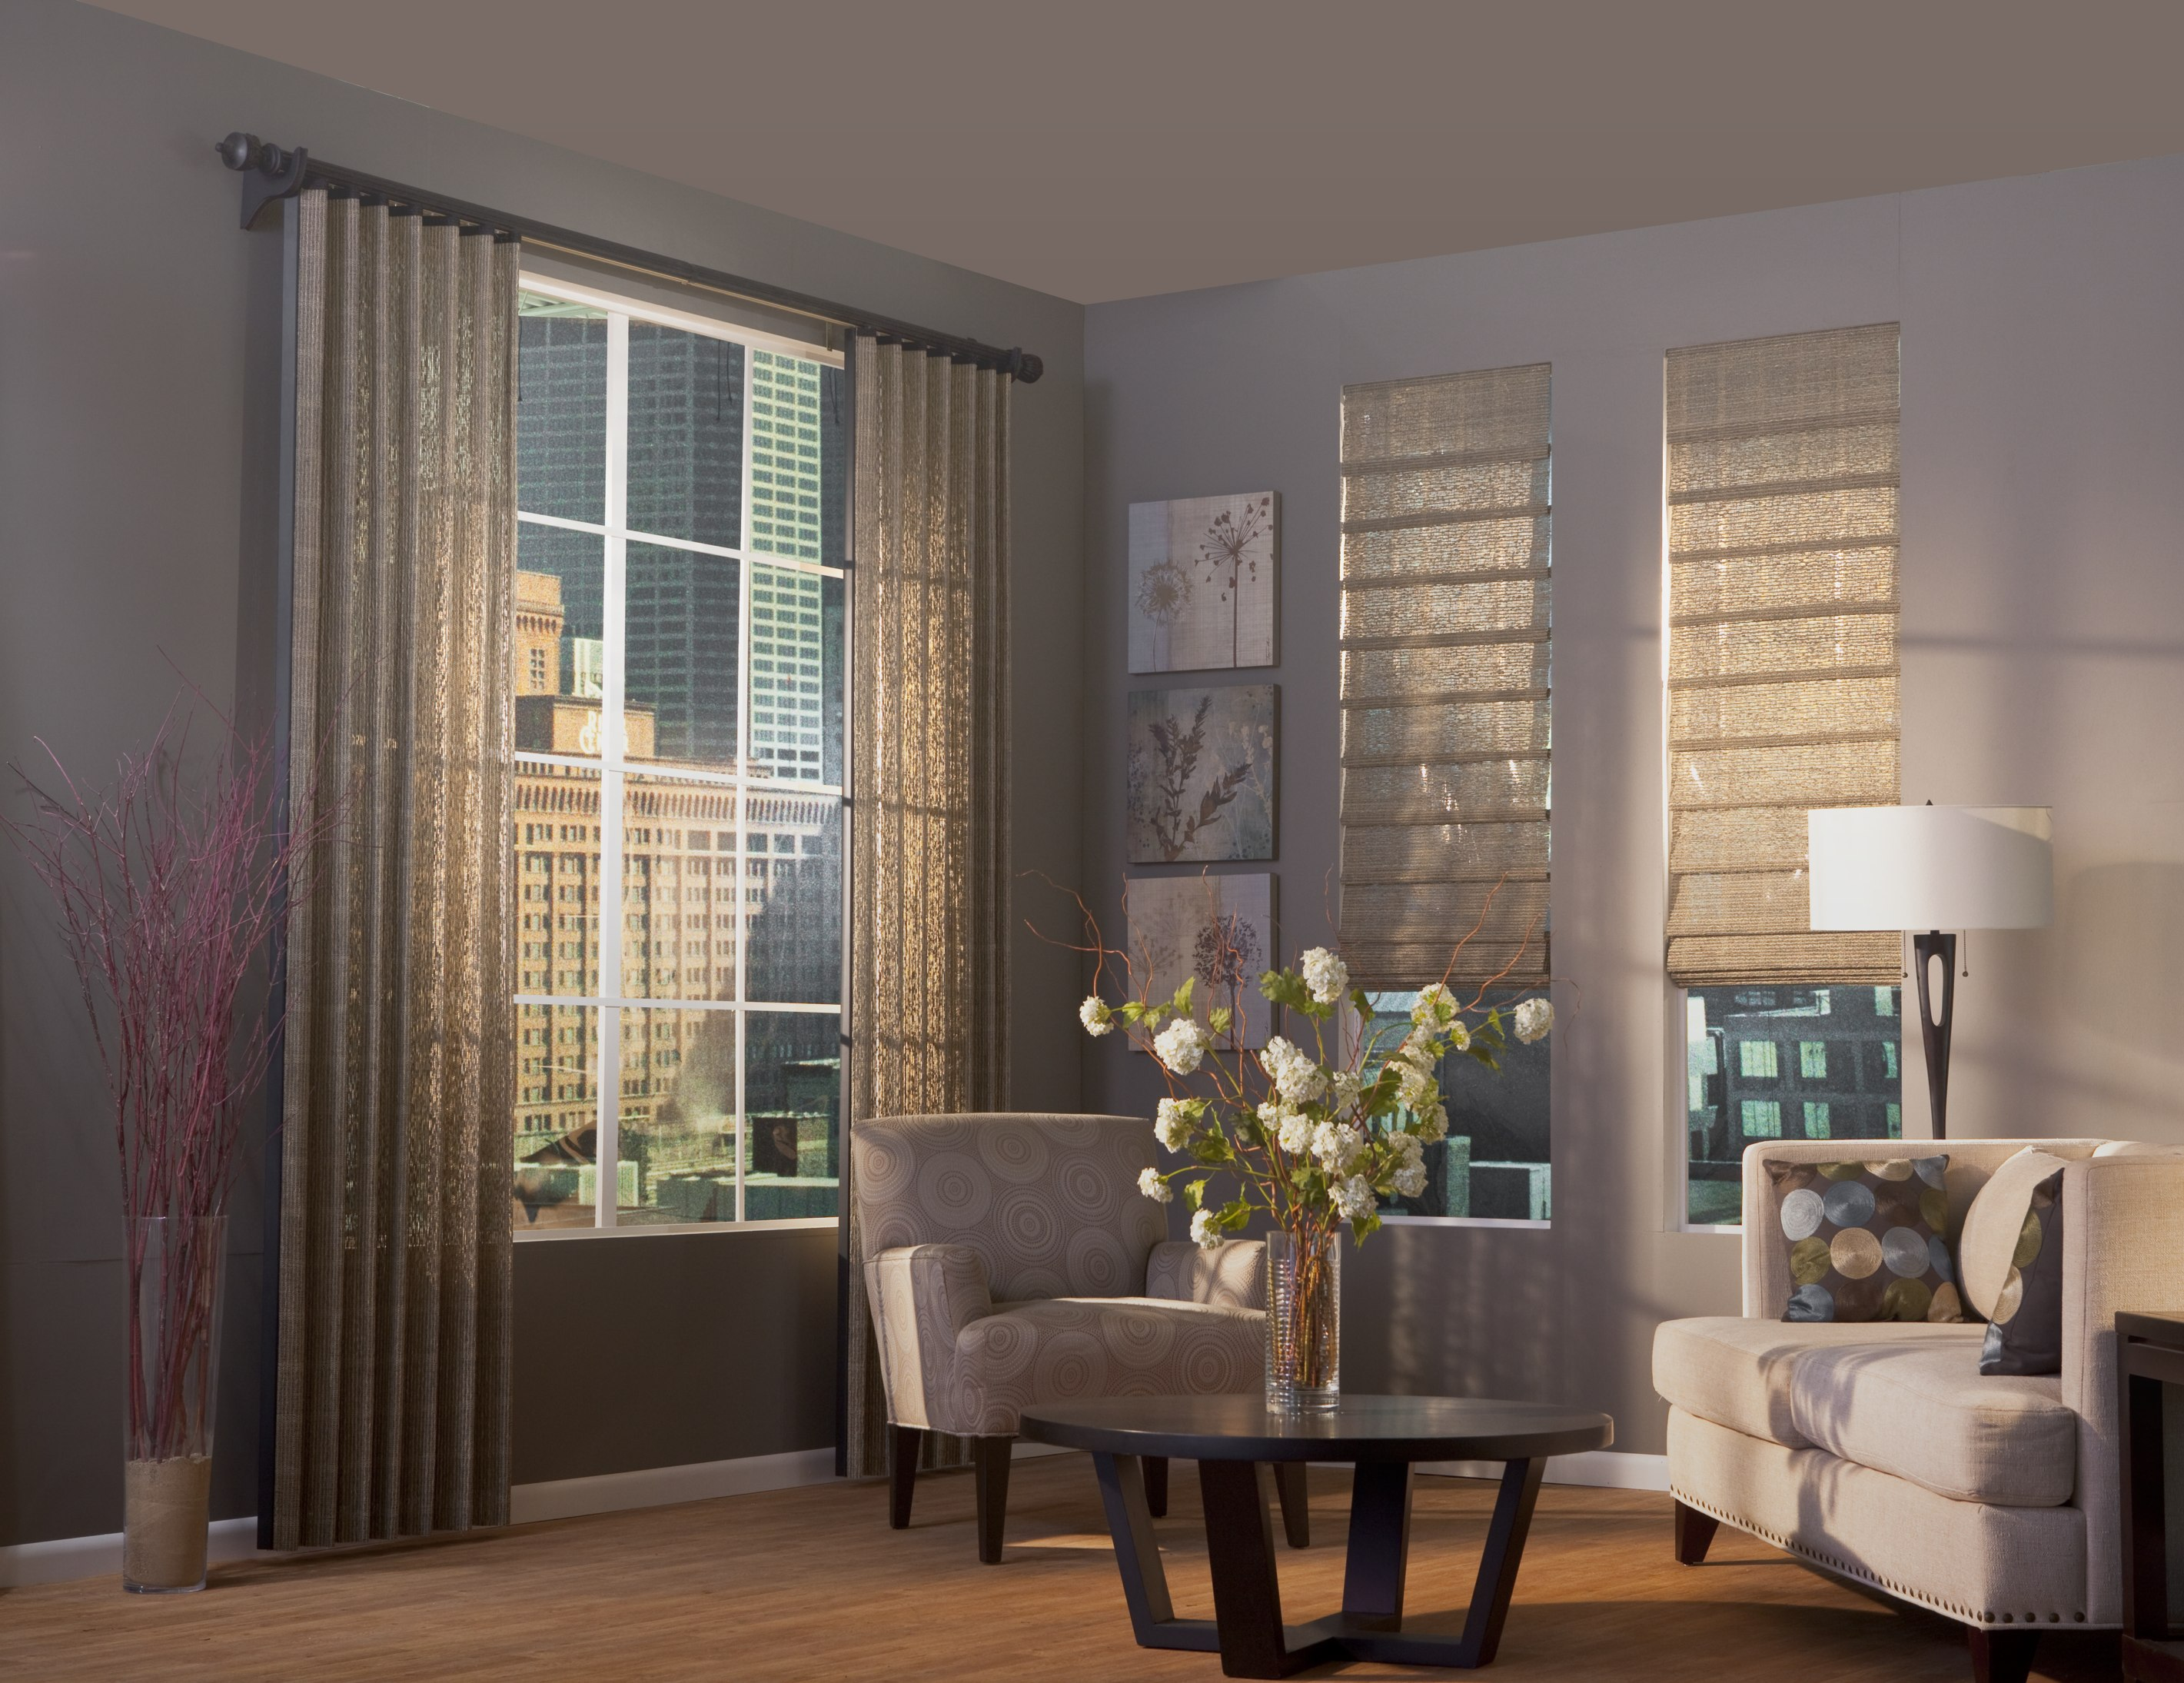 side trendy sunshutcombi combinations drapes and panel laserivorysidepanelcurtain blinds